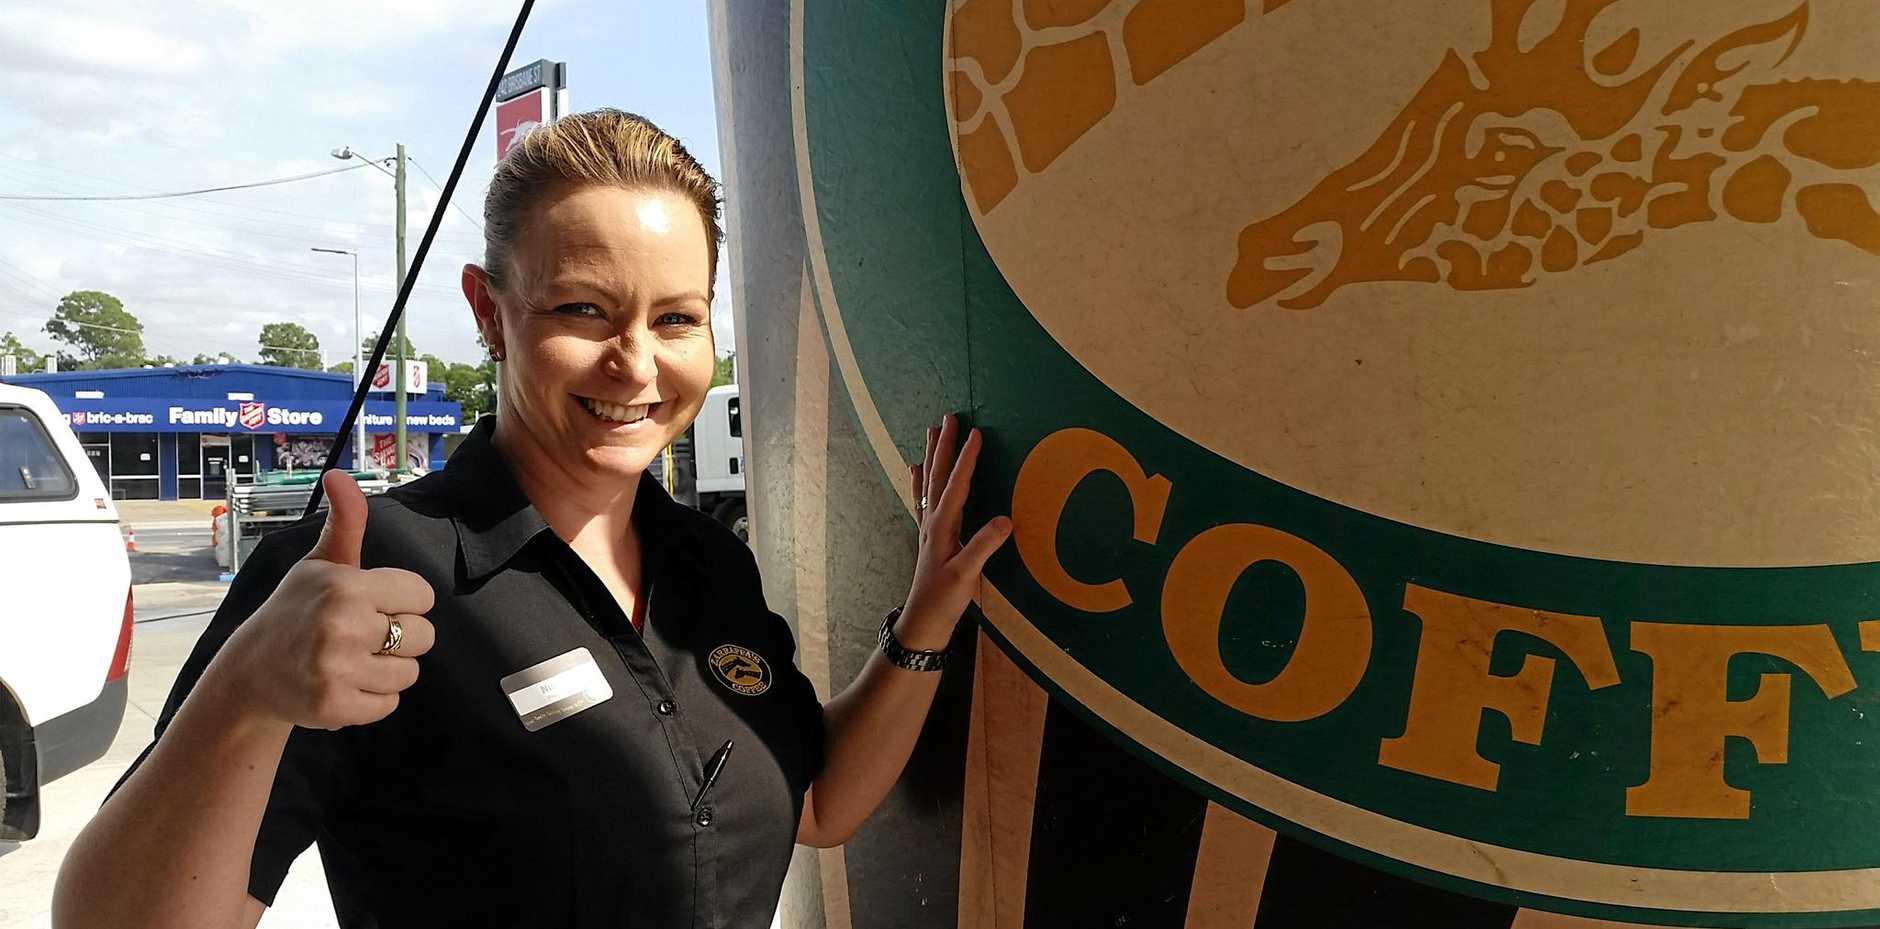 Zarraffa's Coffee West Ipswich franchisee Nicole Penrose.